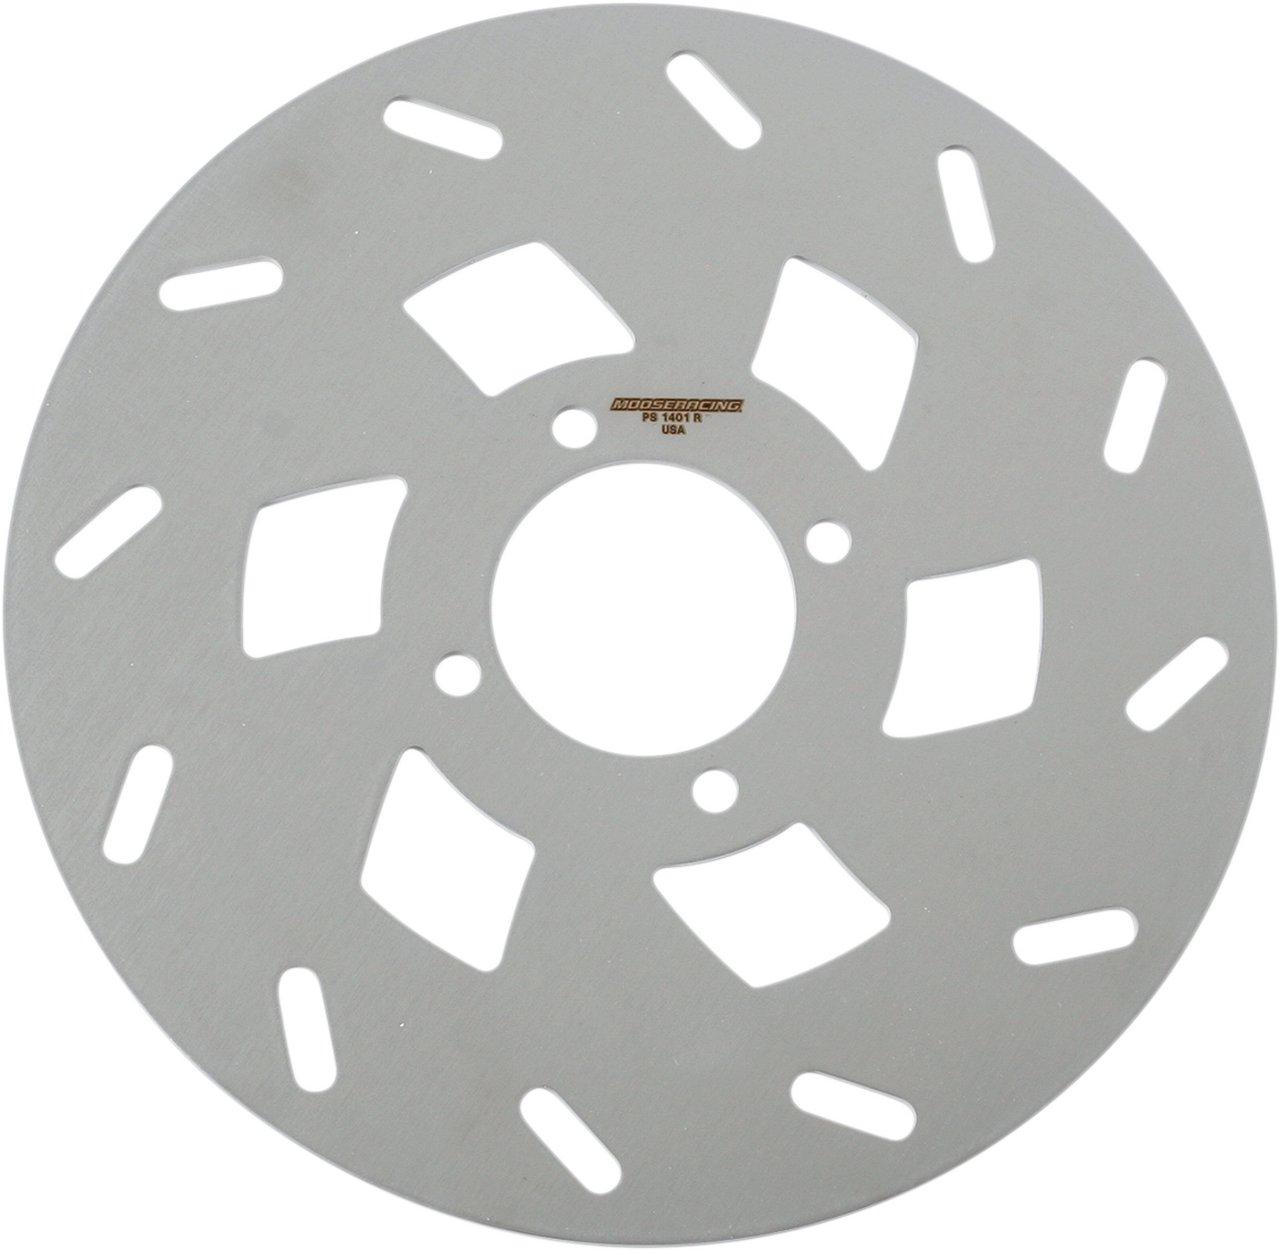 【MOOSE RACING】維修用煞車碟盤 [M061-1401] - 「Webike-摩托百貨」